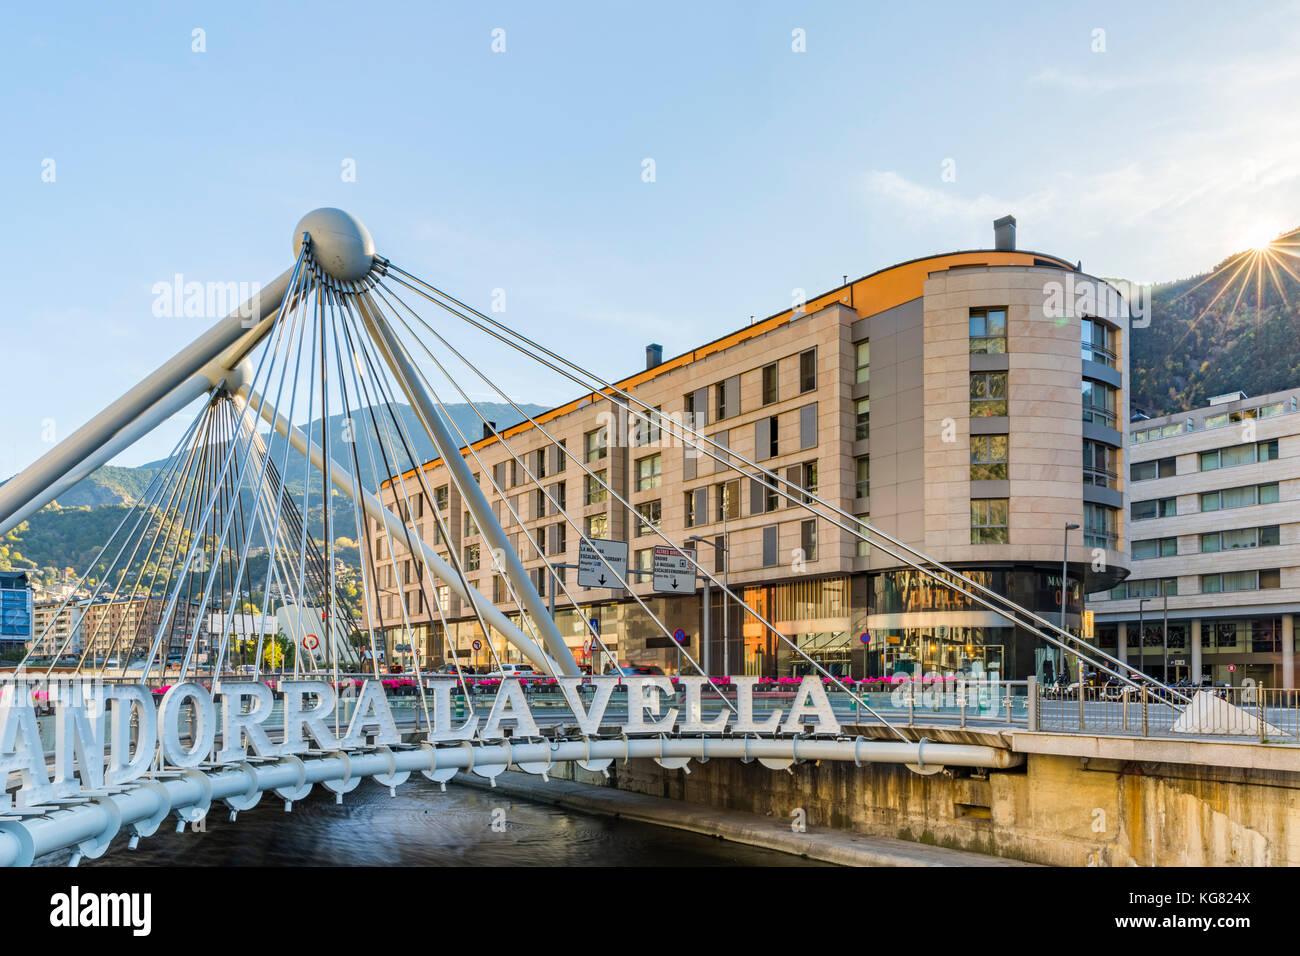 ANDORRA LA VELLA, ANDORRA - OCTOBER 28, 2017: City logo of Andorra la Vella, the capital of the Principality of - Stock Image